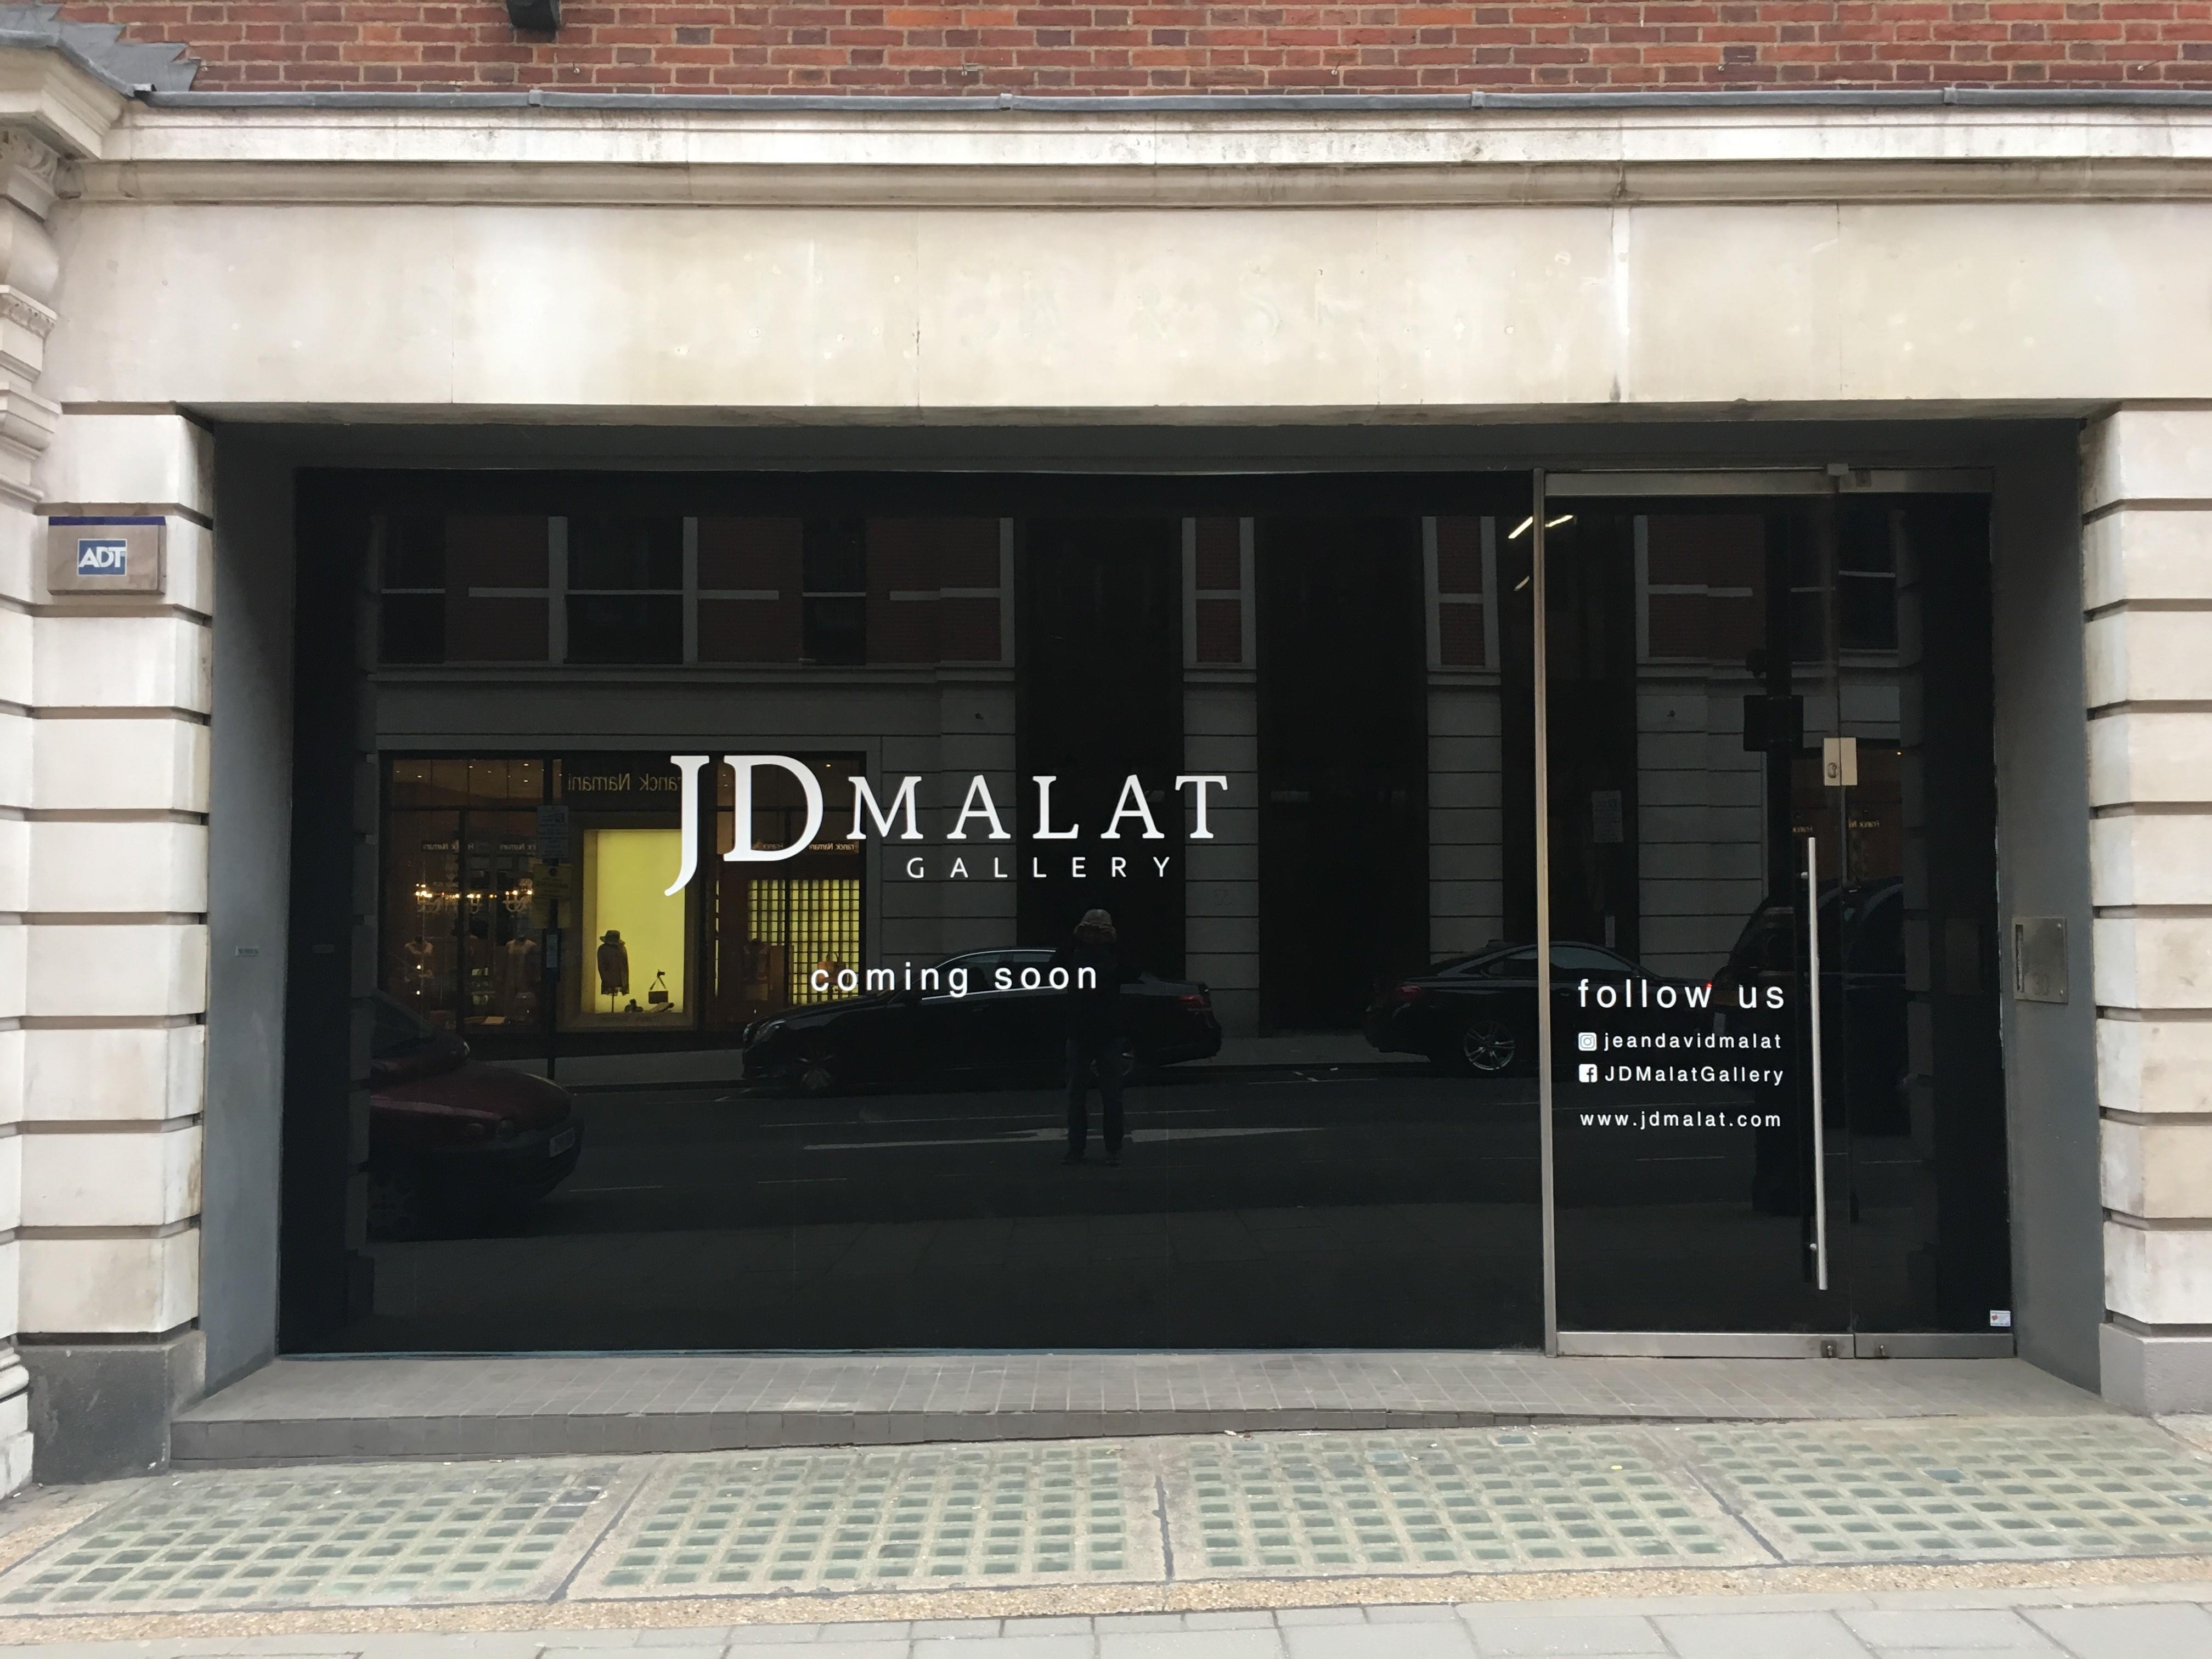 Davies Street (Malat)